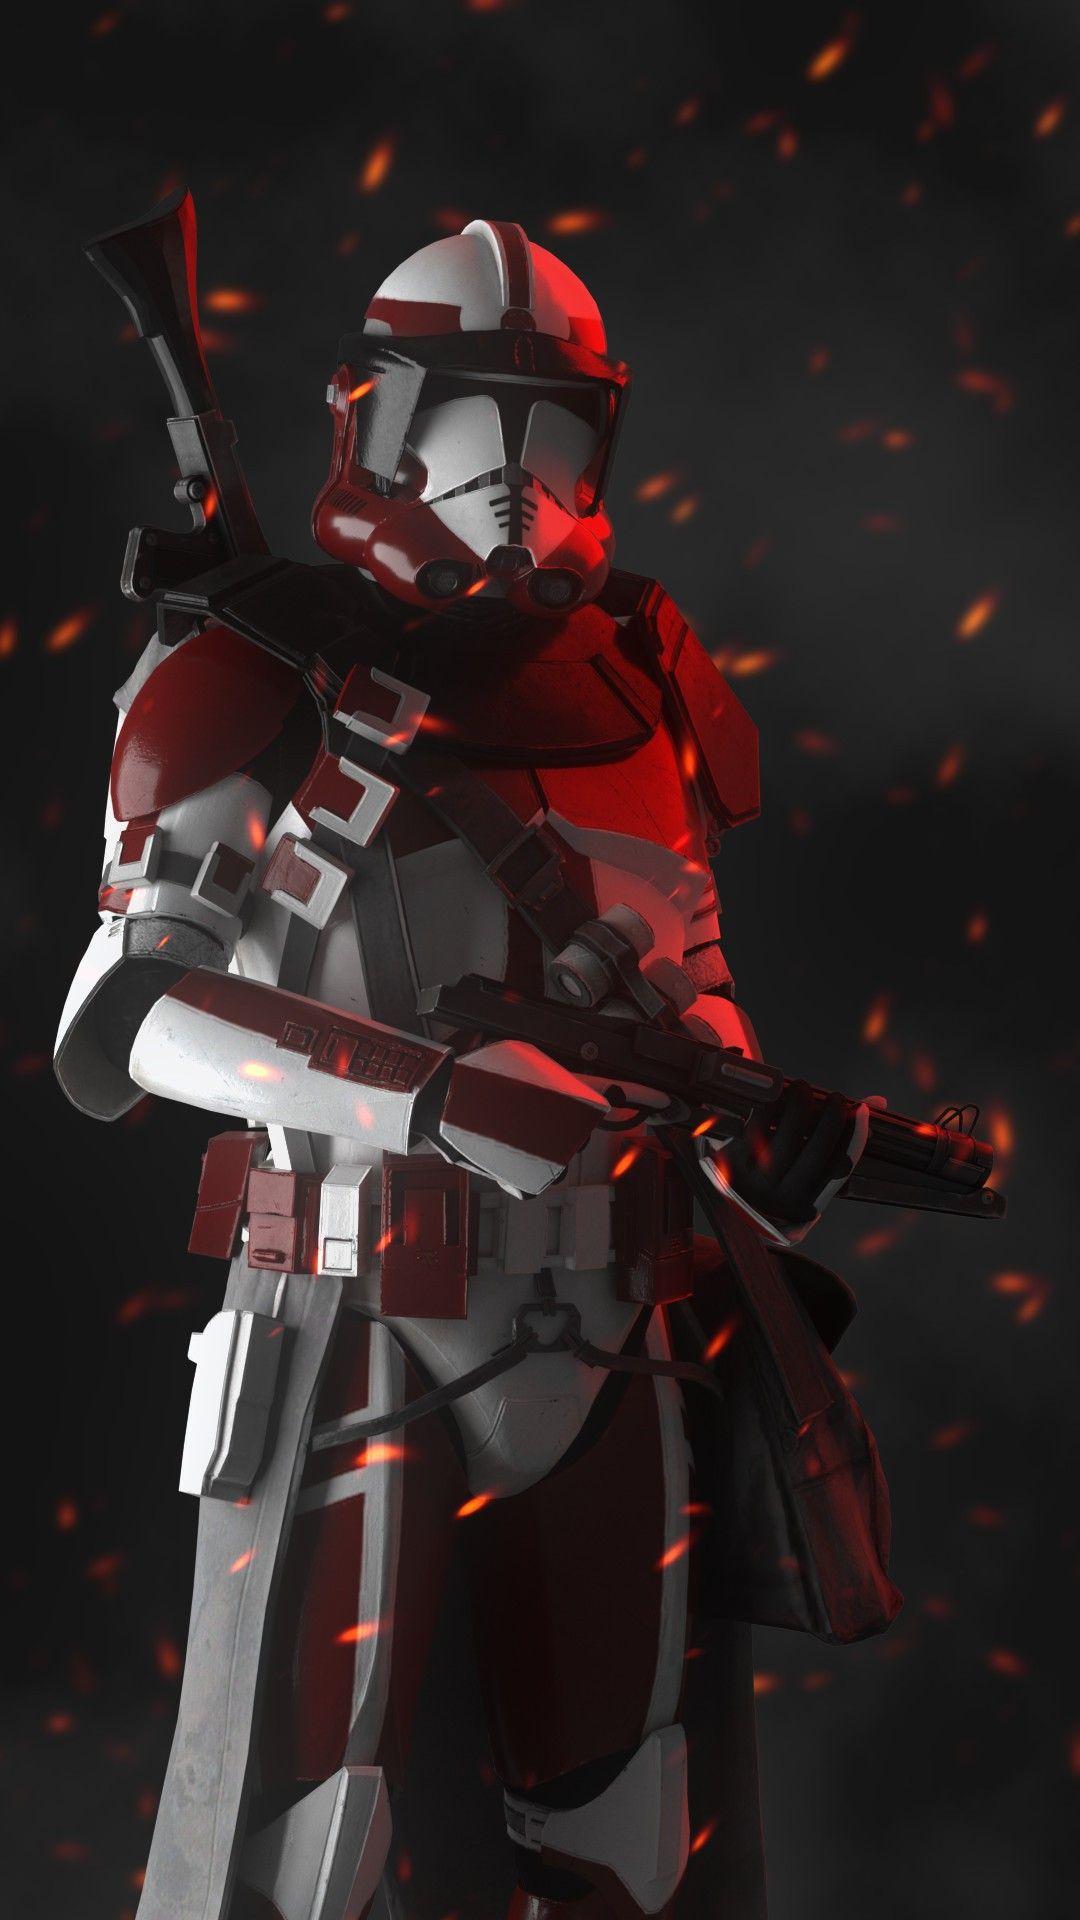 Imperial Strike Force Star Wars Images Star Wars Background Star Wars Pictures